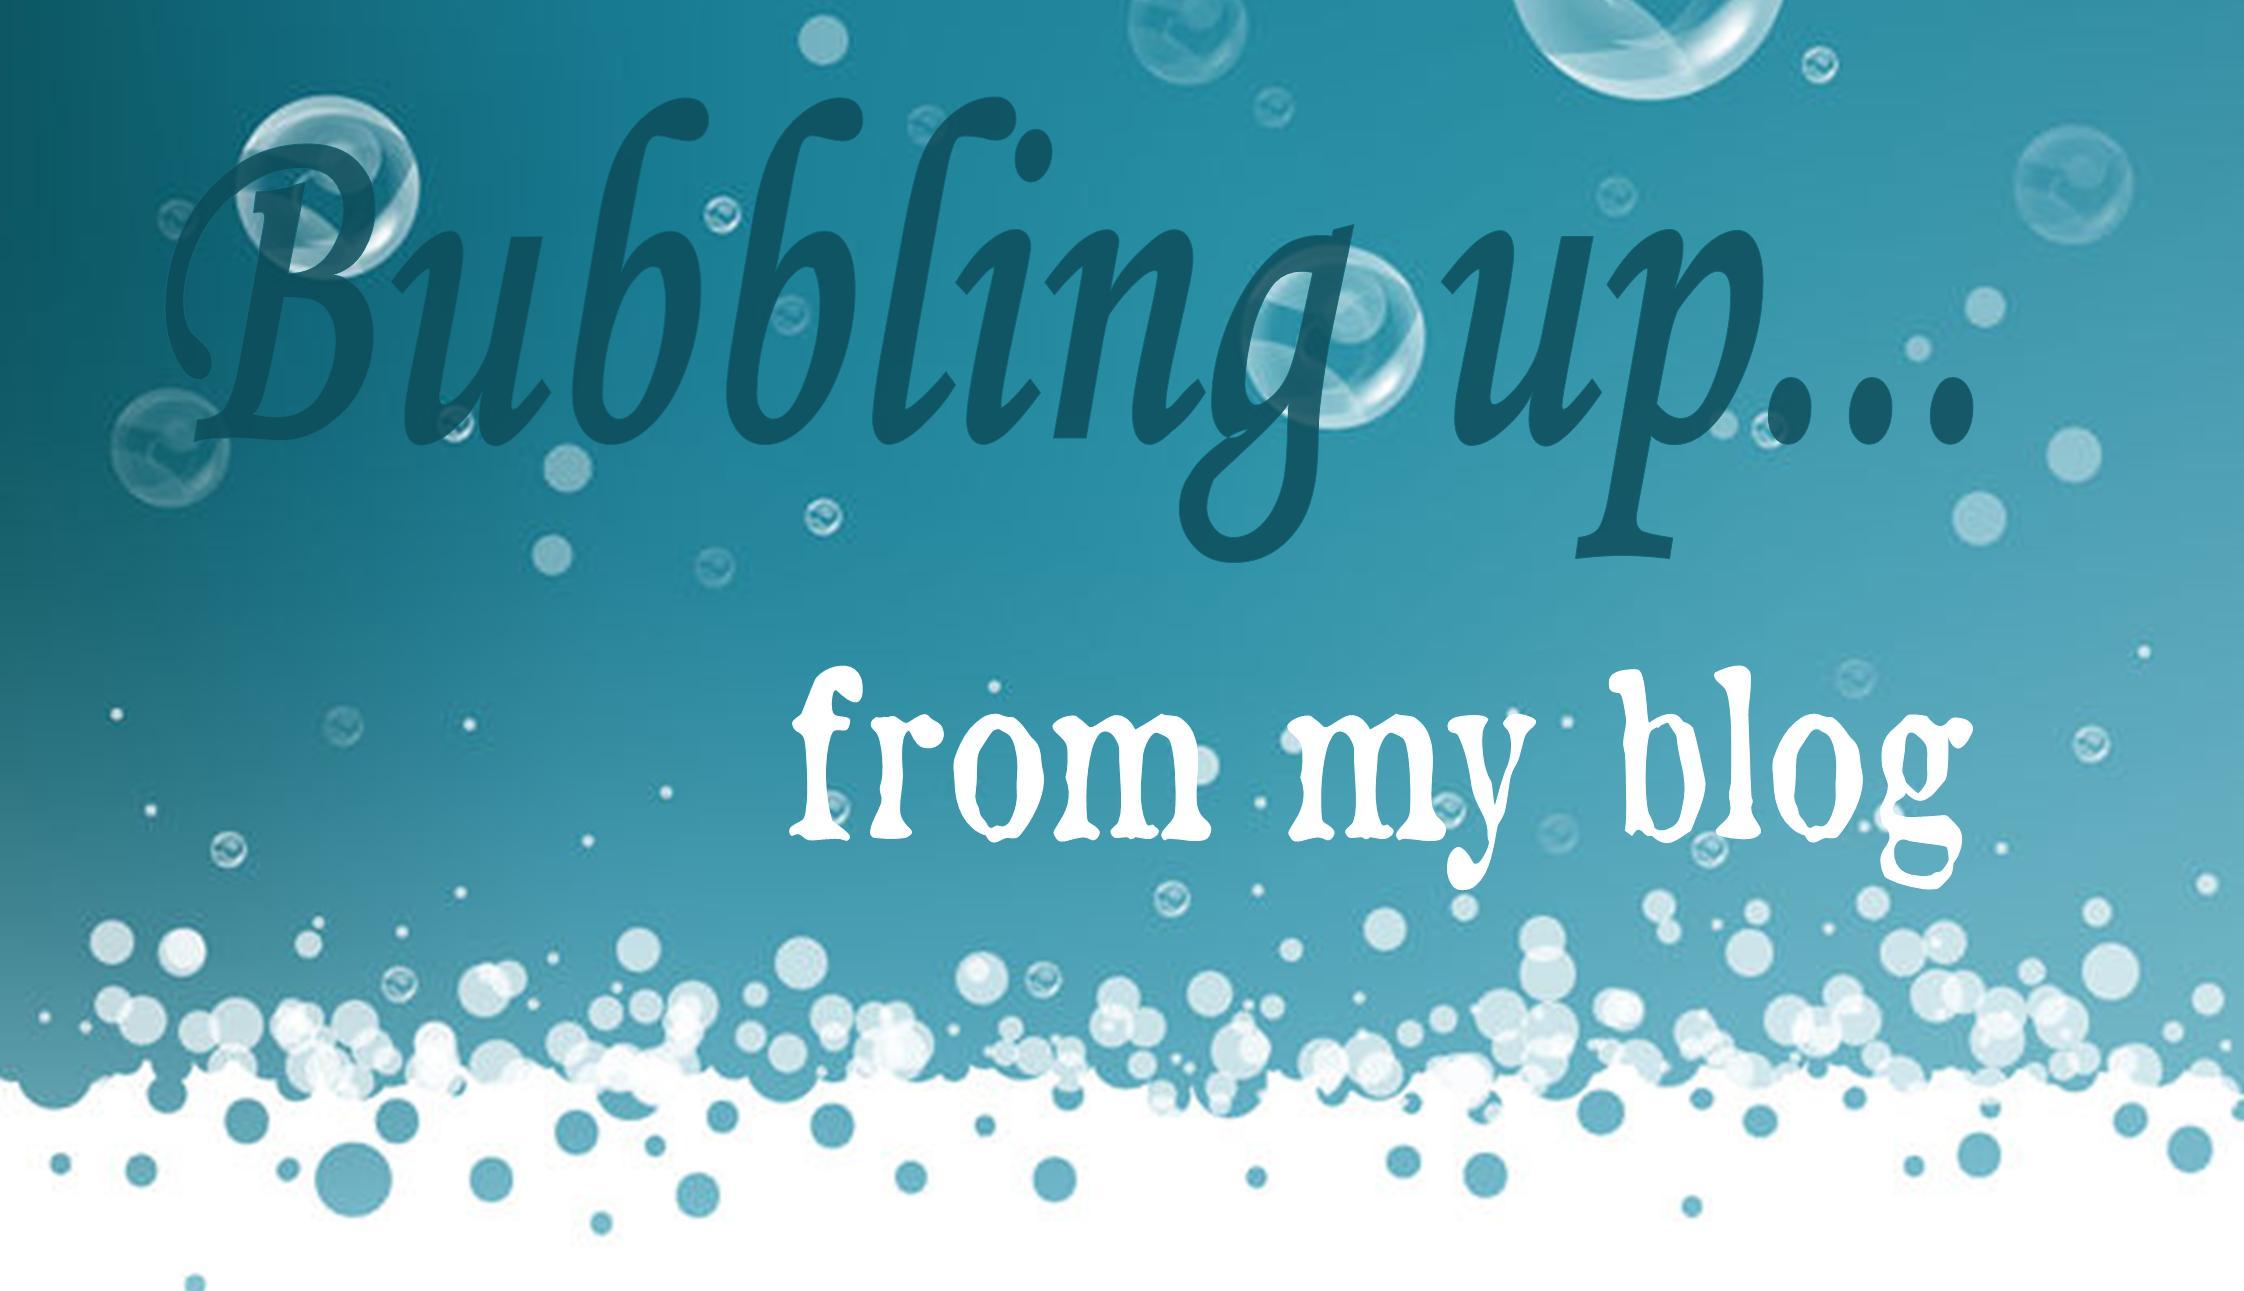 Bubbling-up-blog2.jpg